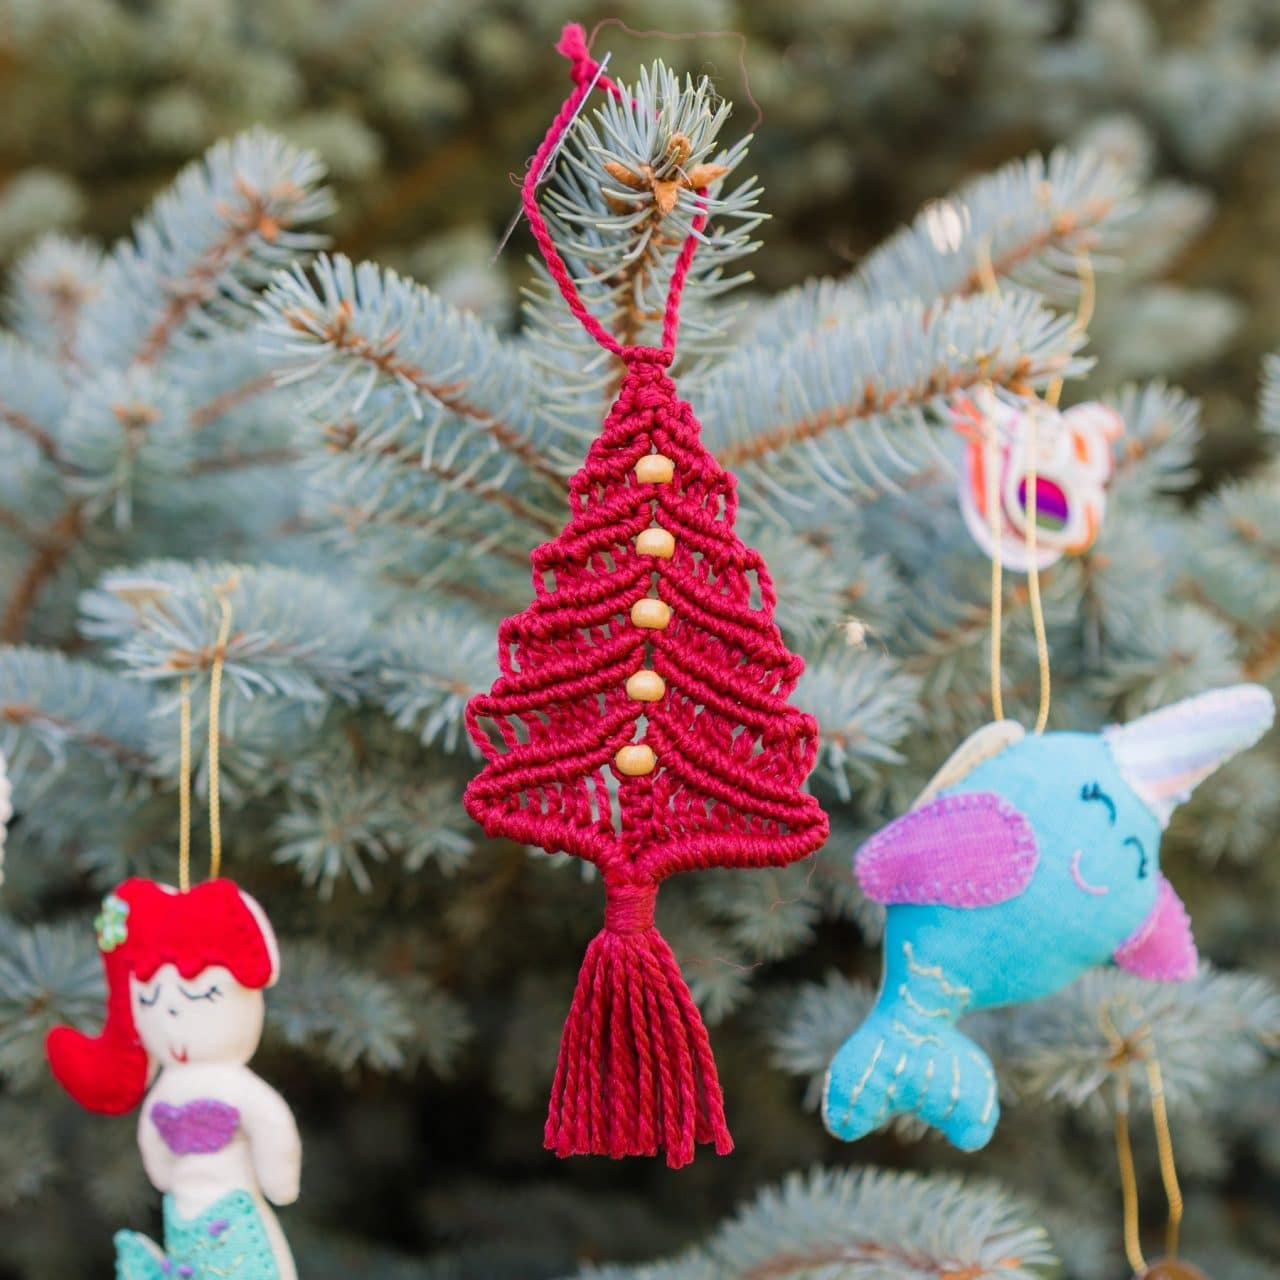 Macrame Tree Ornament